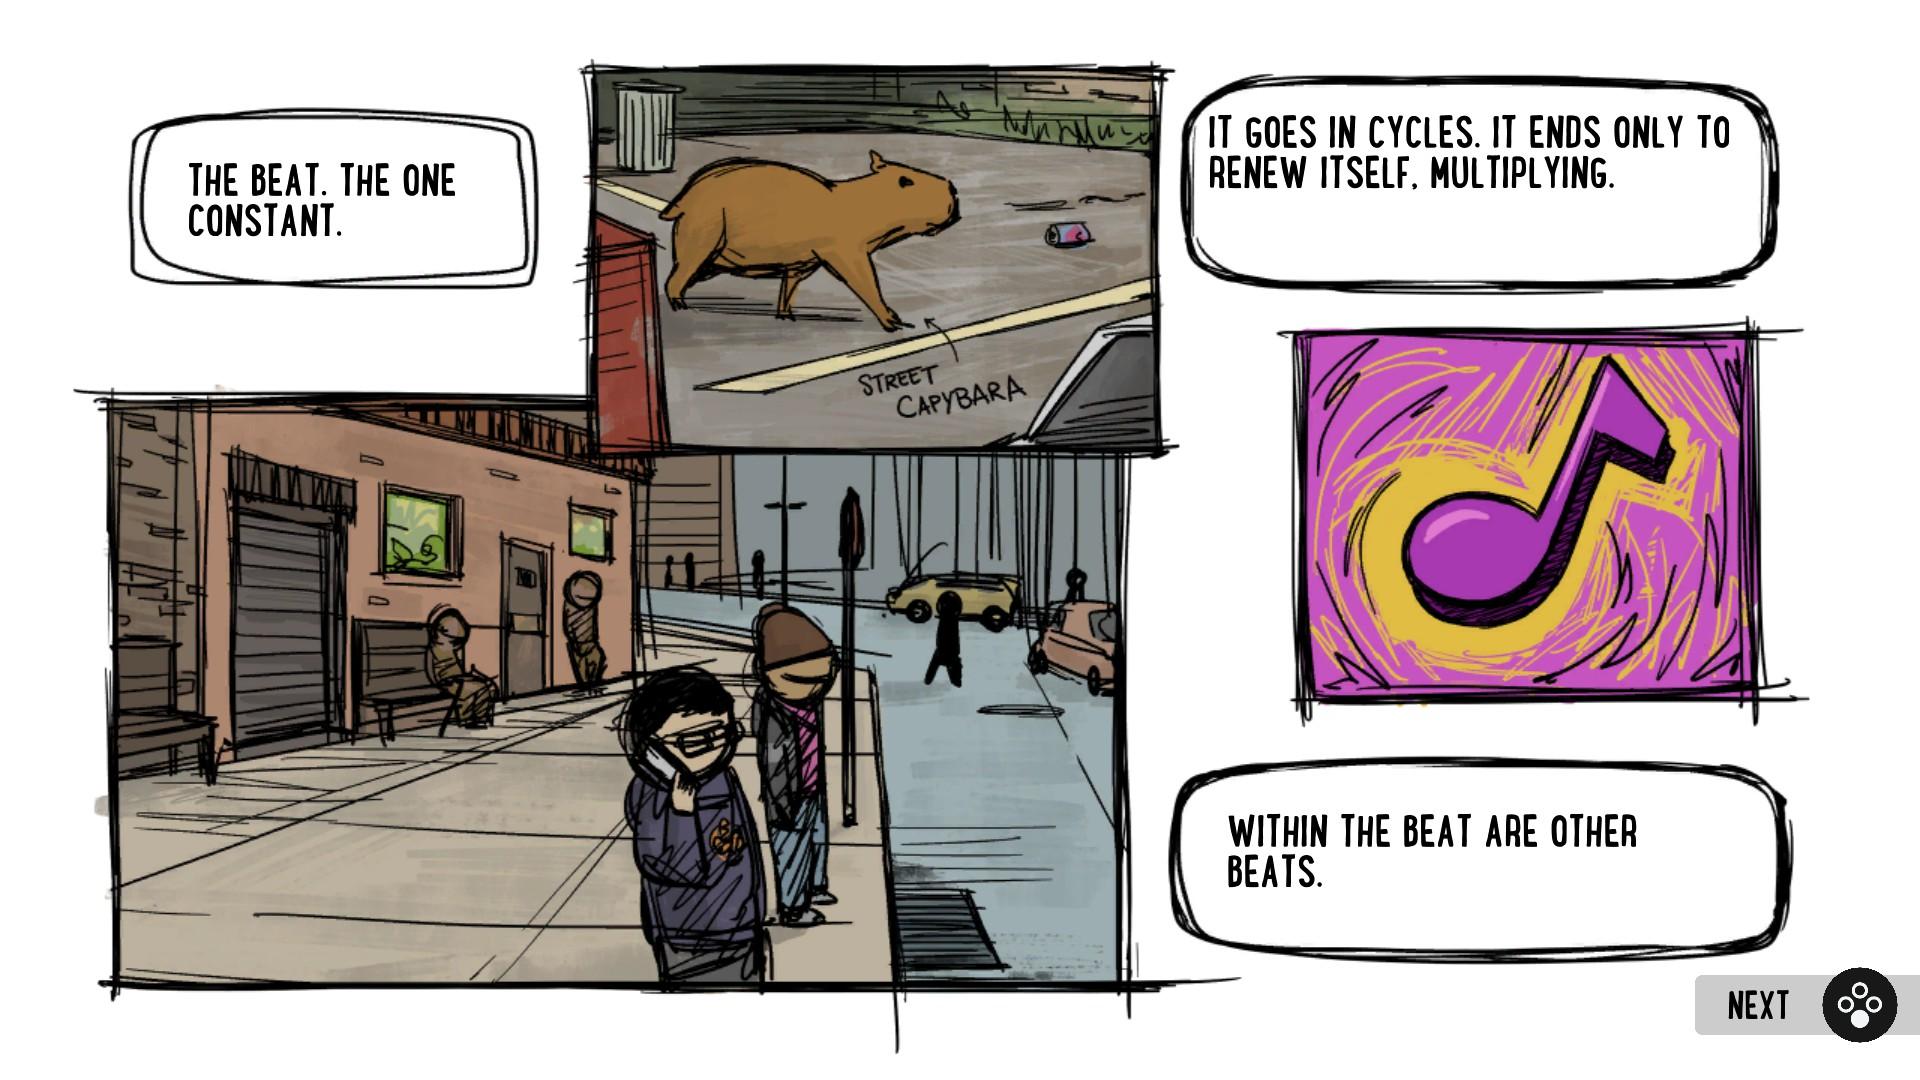 Some sage advice from Street Capybara.